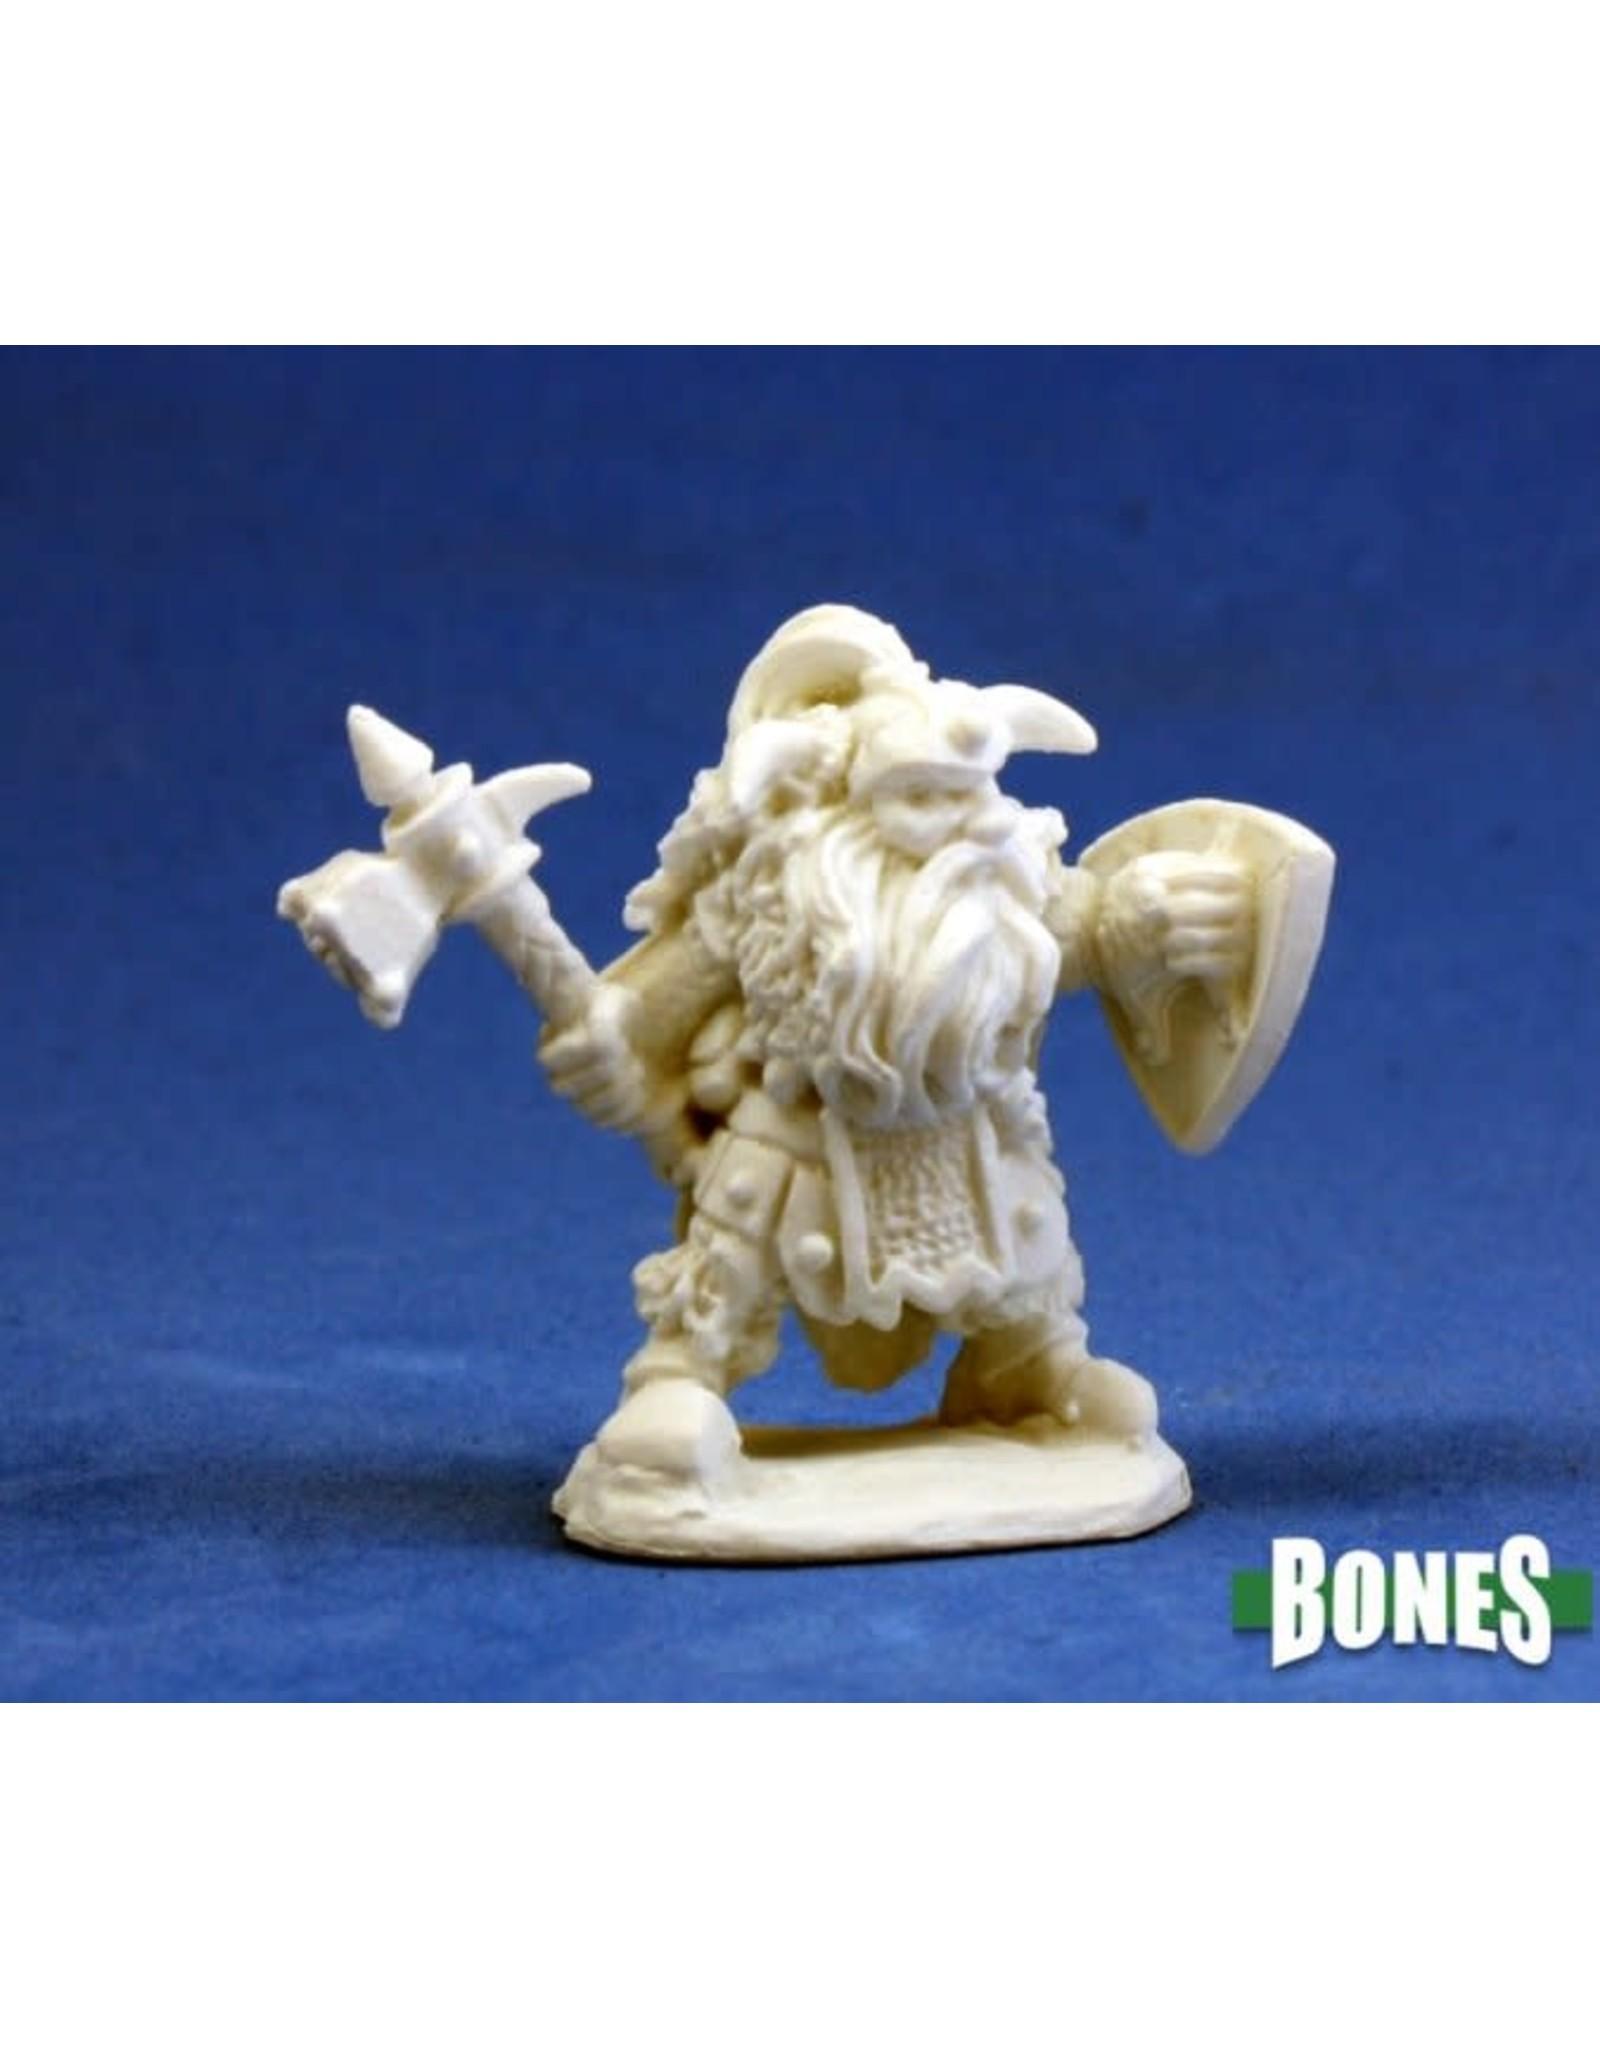 Reaper Dark Heaven Bones: Fulumbar Ironhand Dwarf Warrior